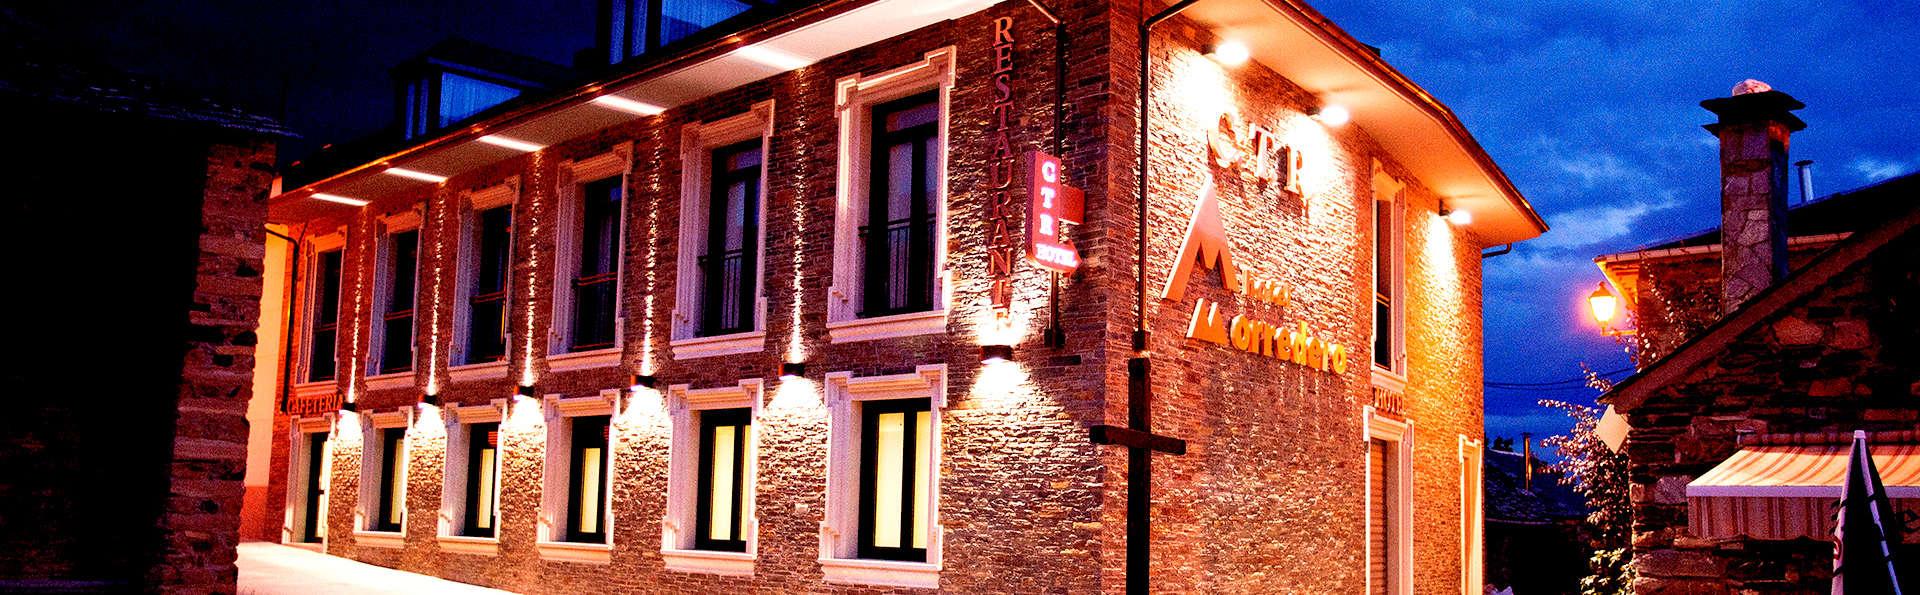 Hotel Rural Morredero - Edit_Front2.jpg